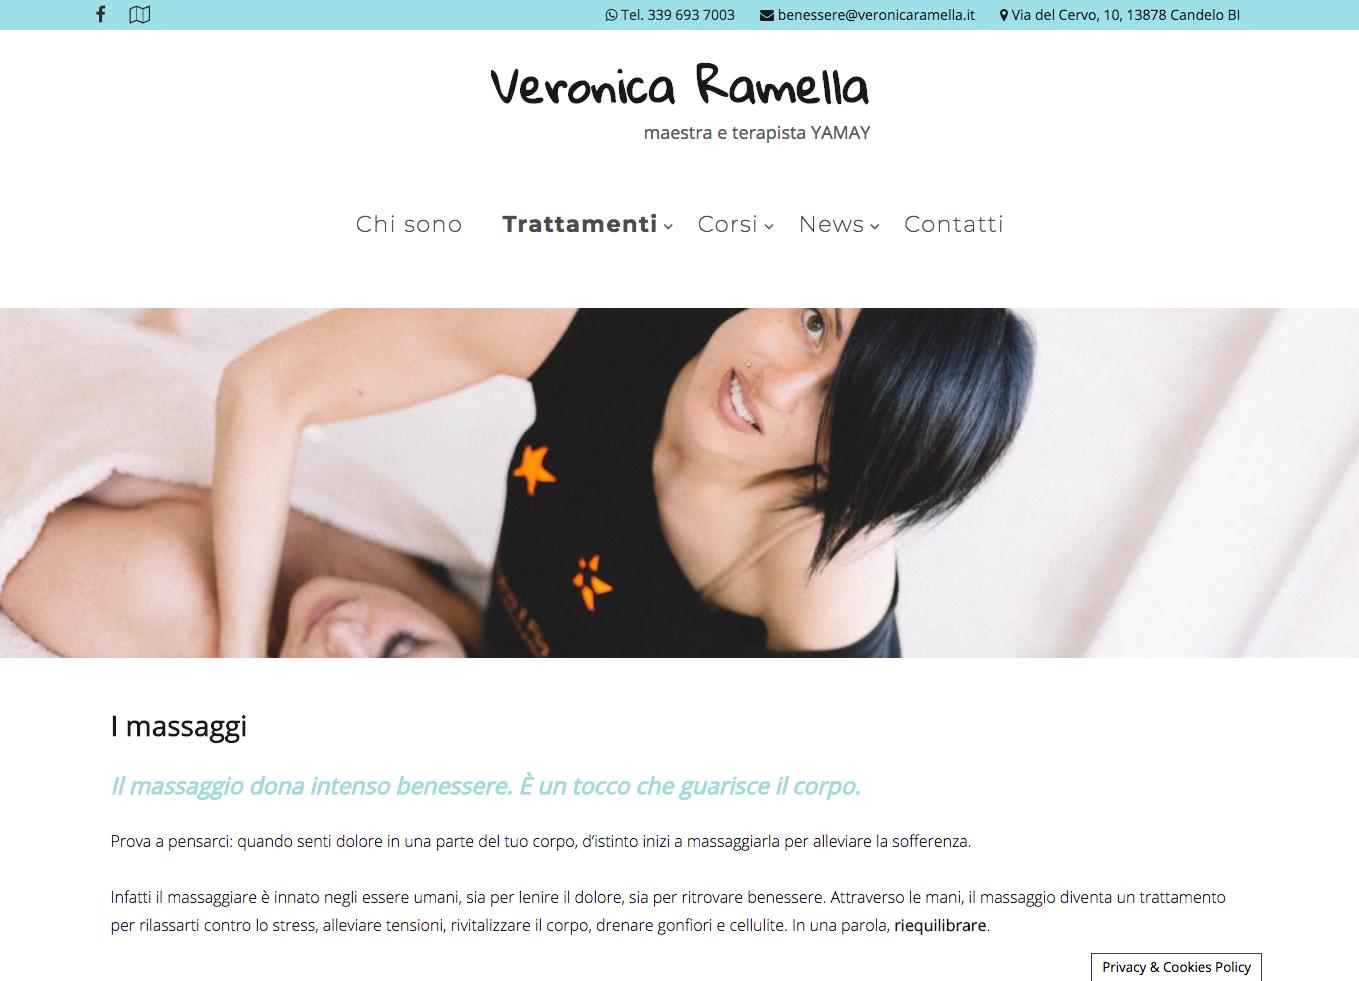 Veronica Ramella YamaY